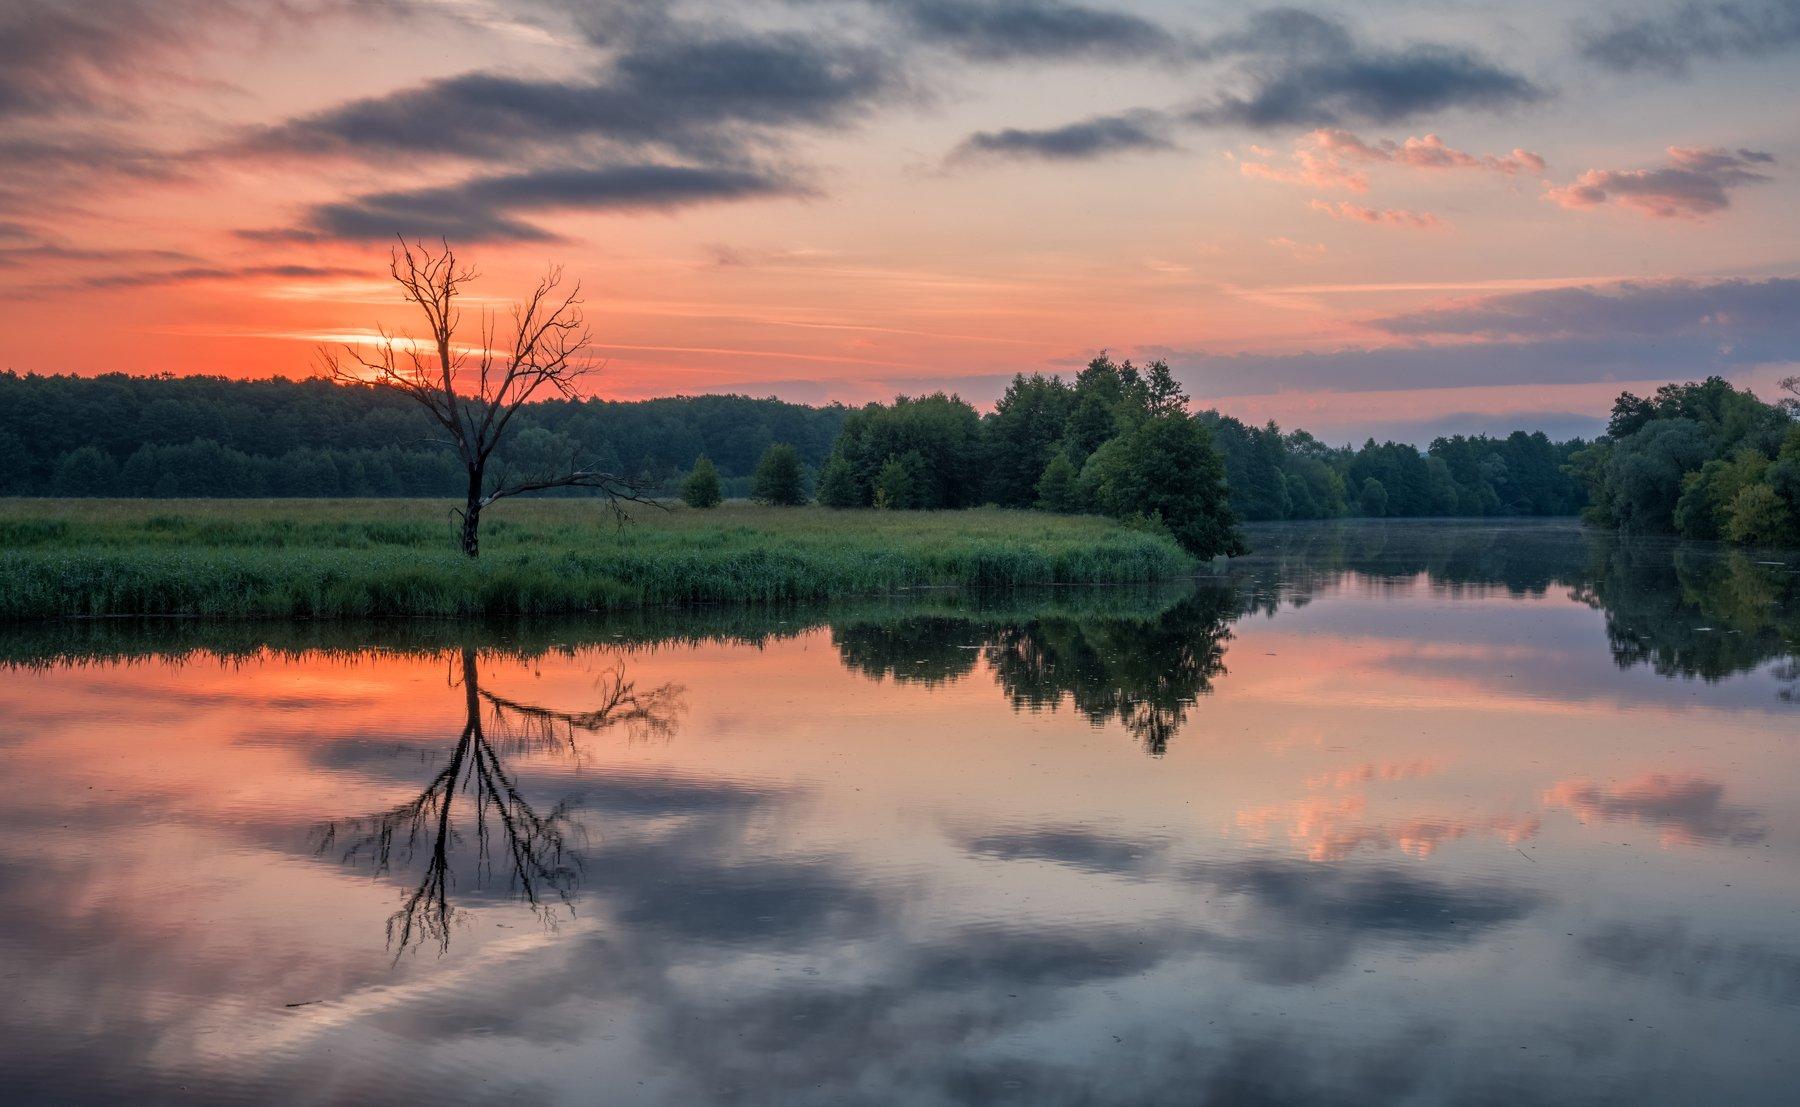 рассвет, пейзаж, природа, утро, река, дерево, небо, Виталий Левыкин